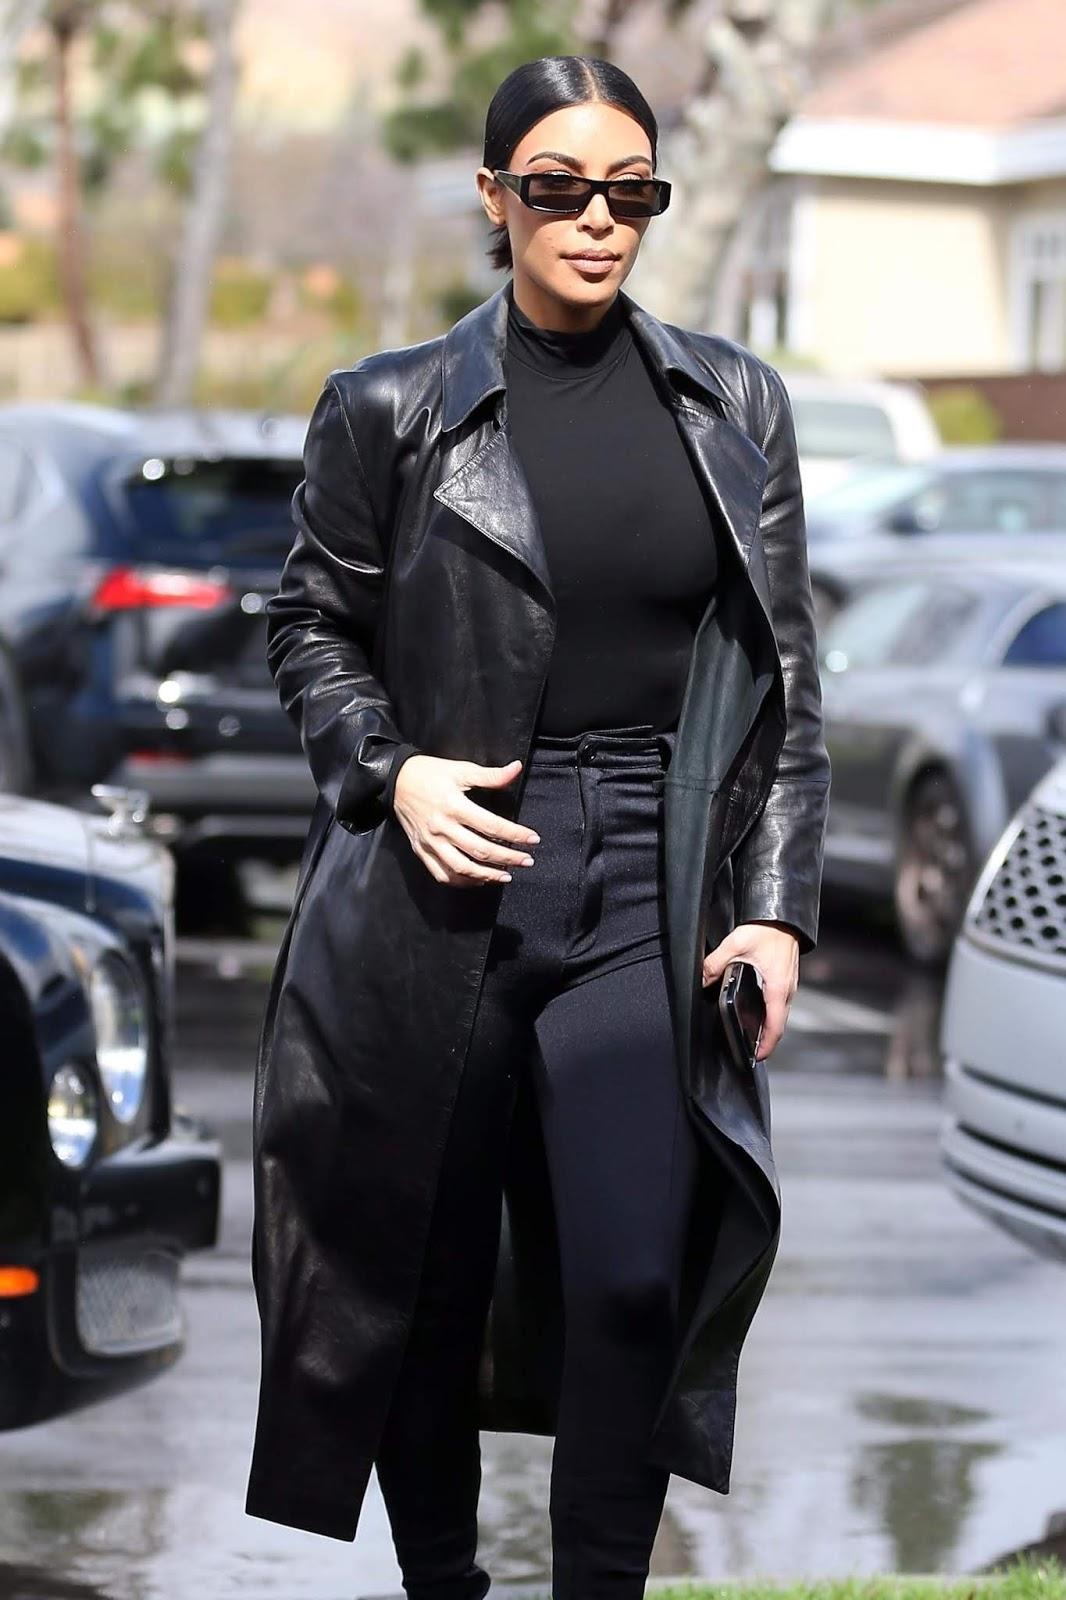 Kim Kardashian - Spotted grabbing lunch in Los Angeles 02/04/2019